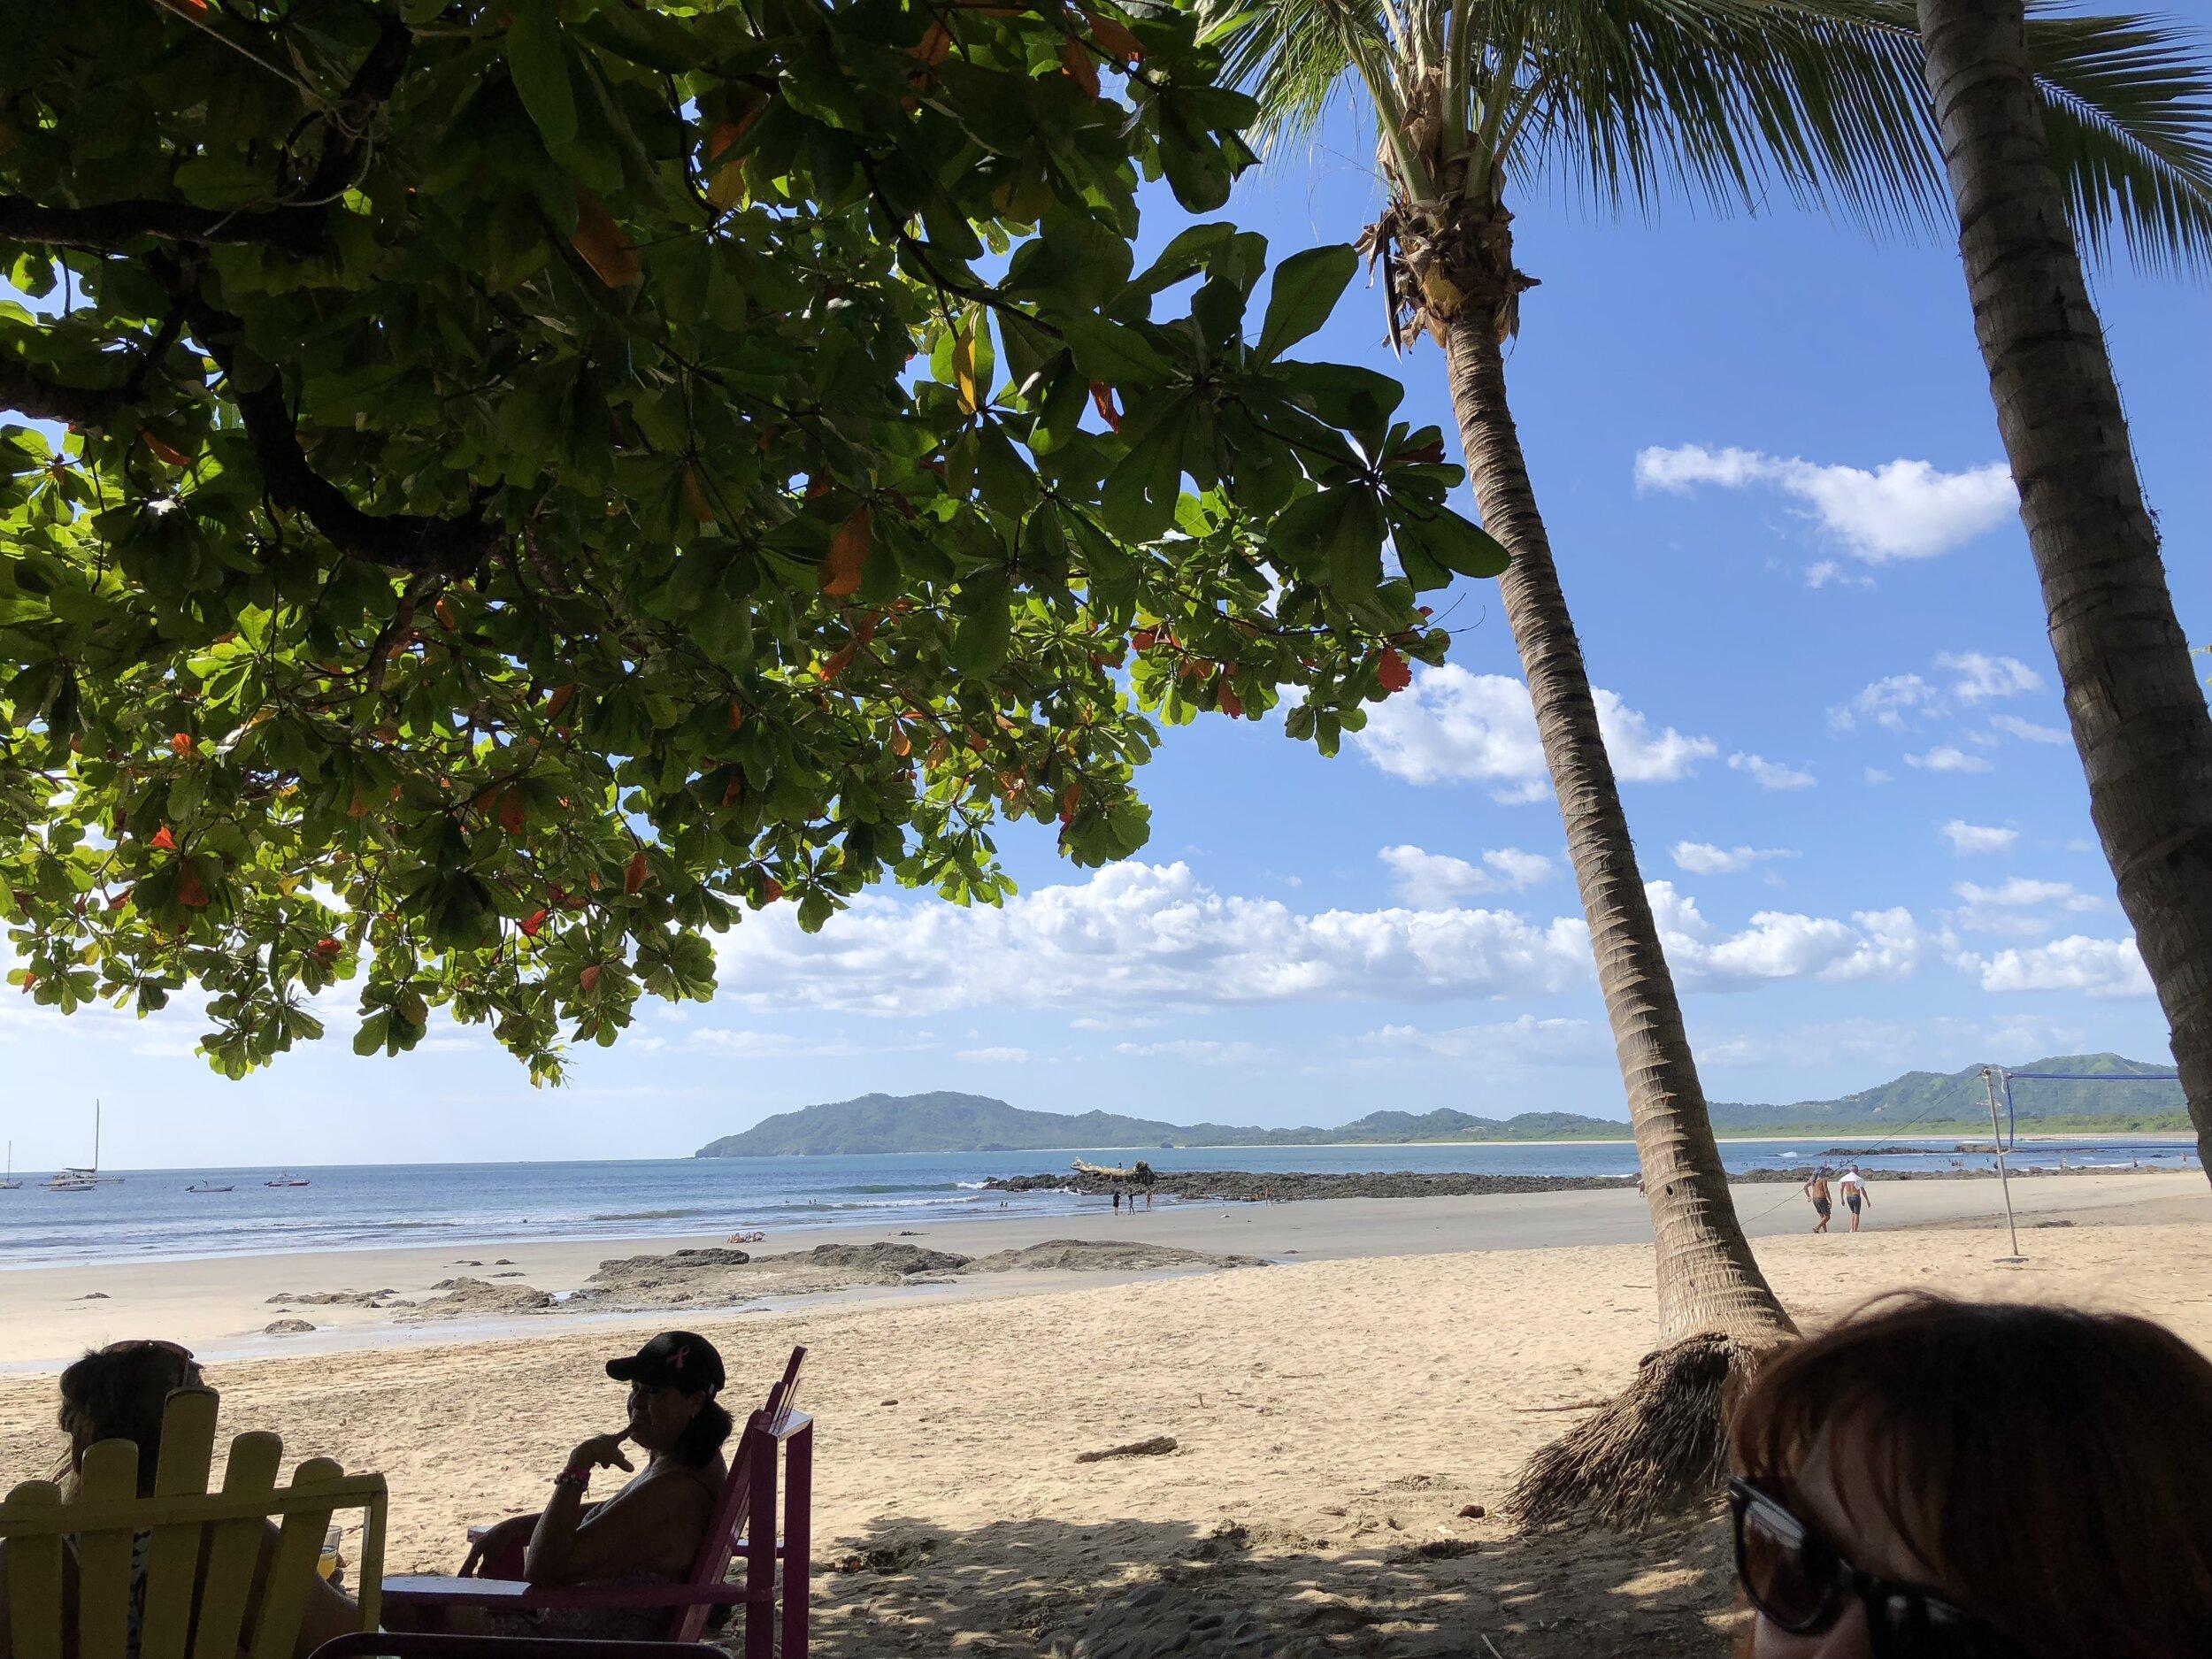 Beach in nearby Tamarindo